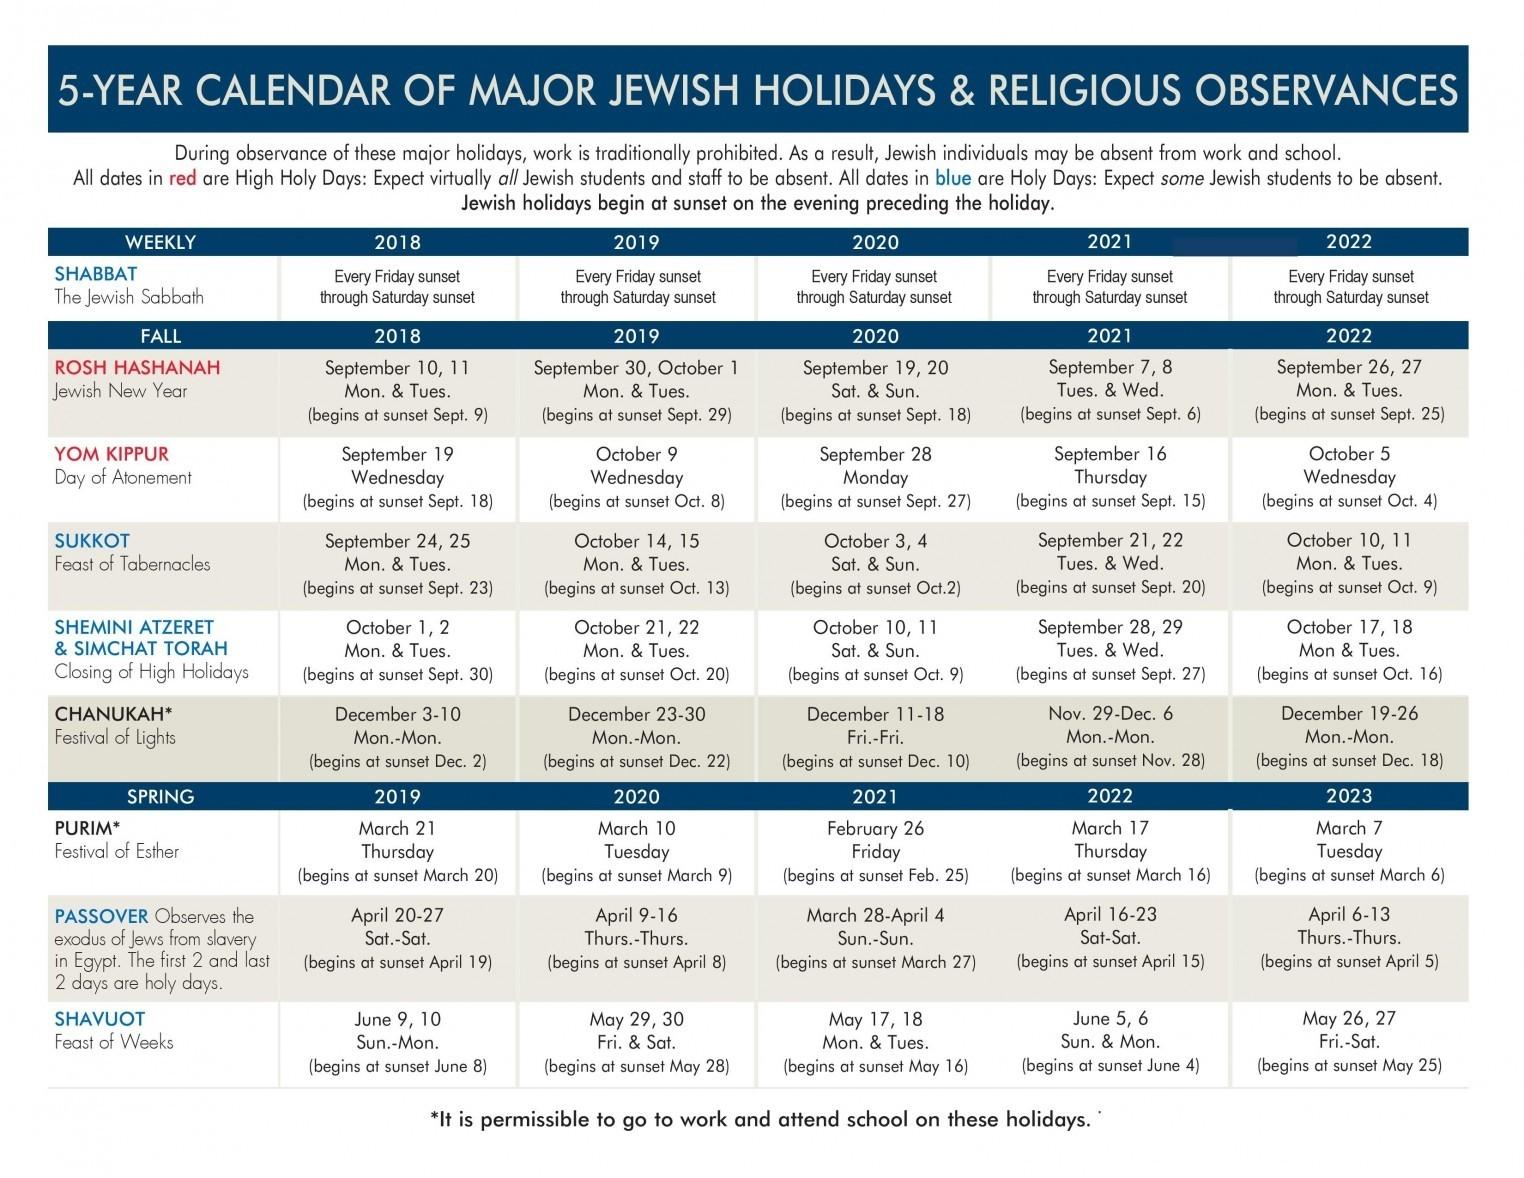 5-Year Jewish Holiday Calendar | Jewish Federation Of-Calendar Of Jewish Holidays